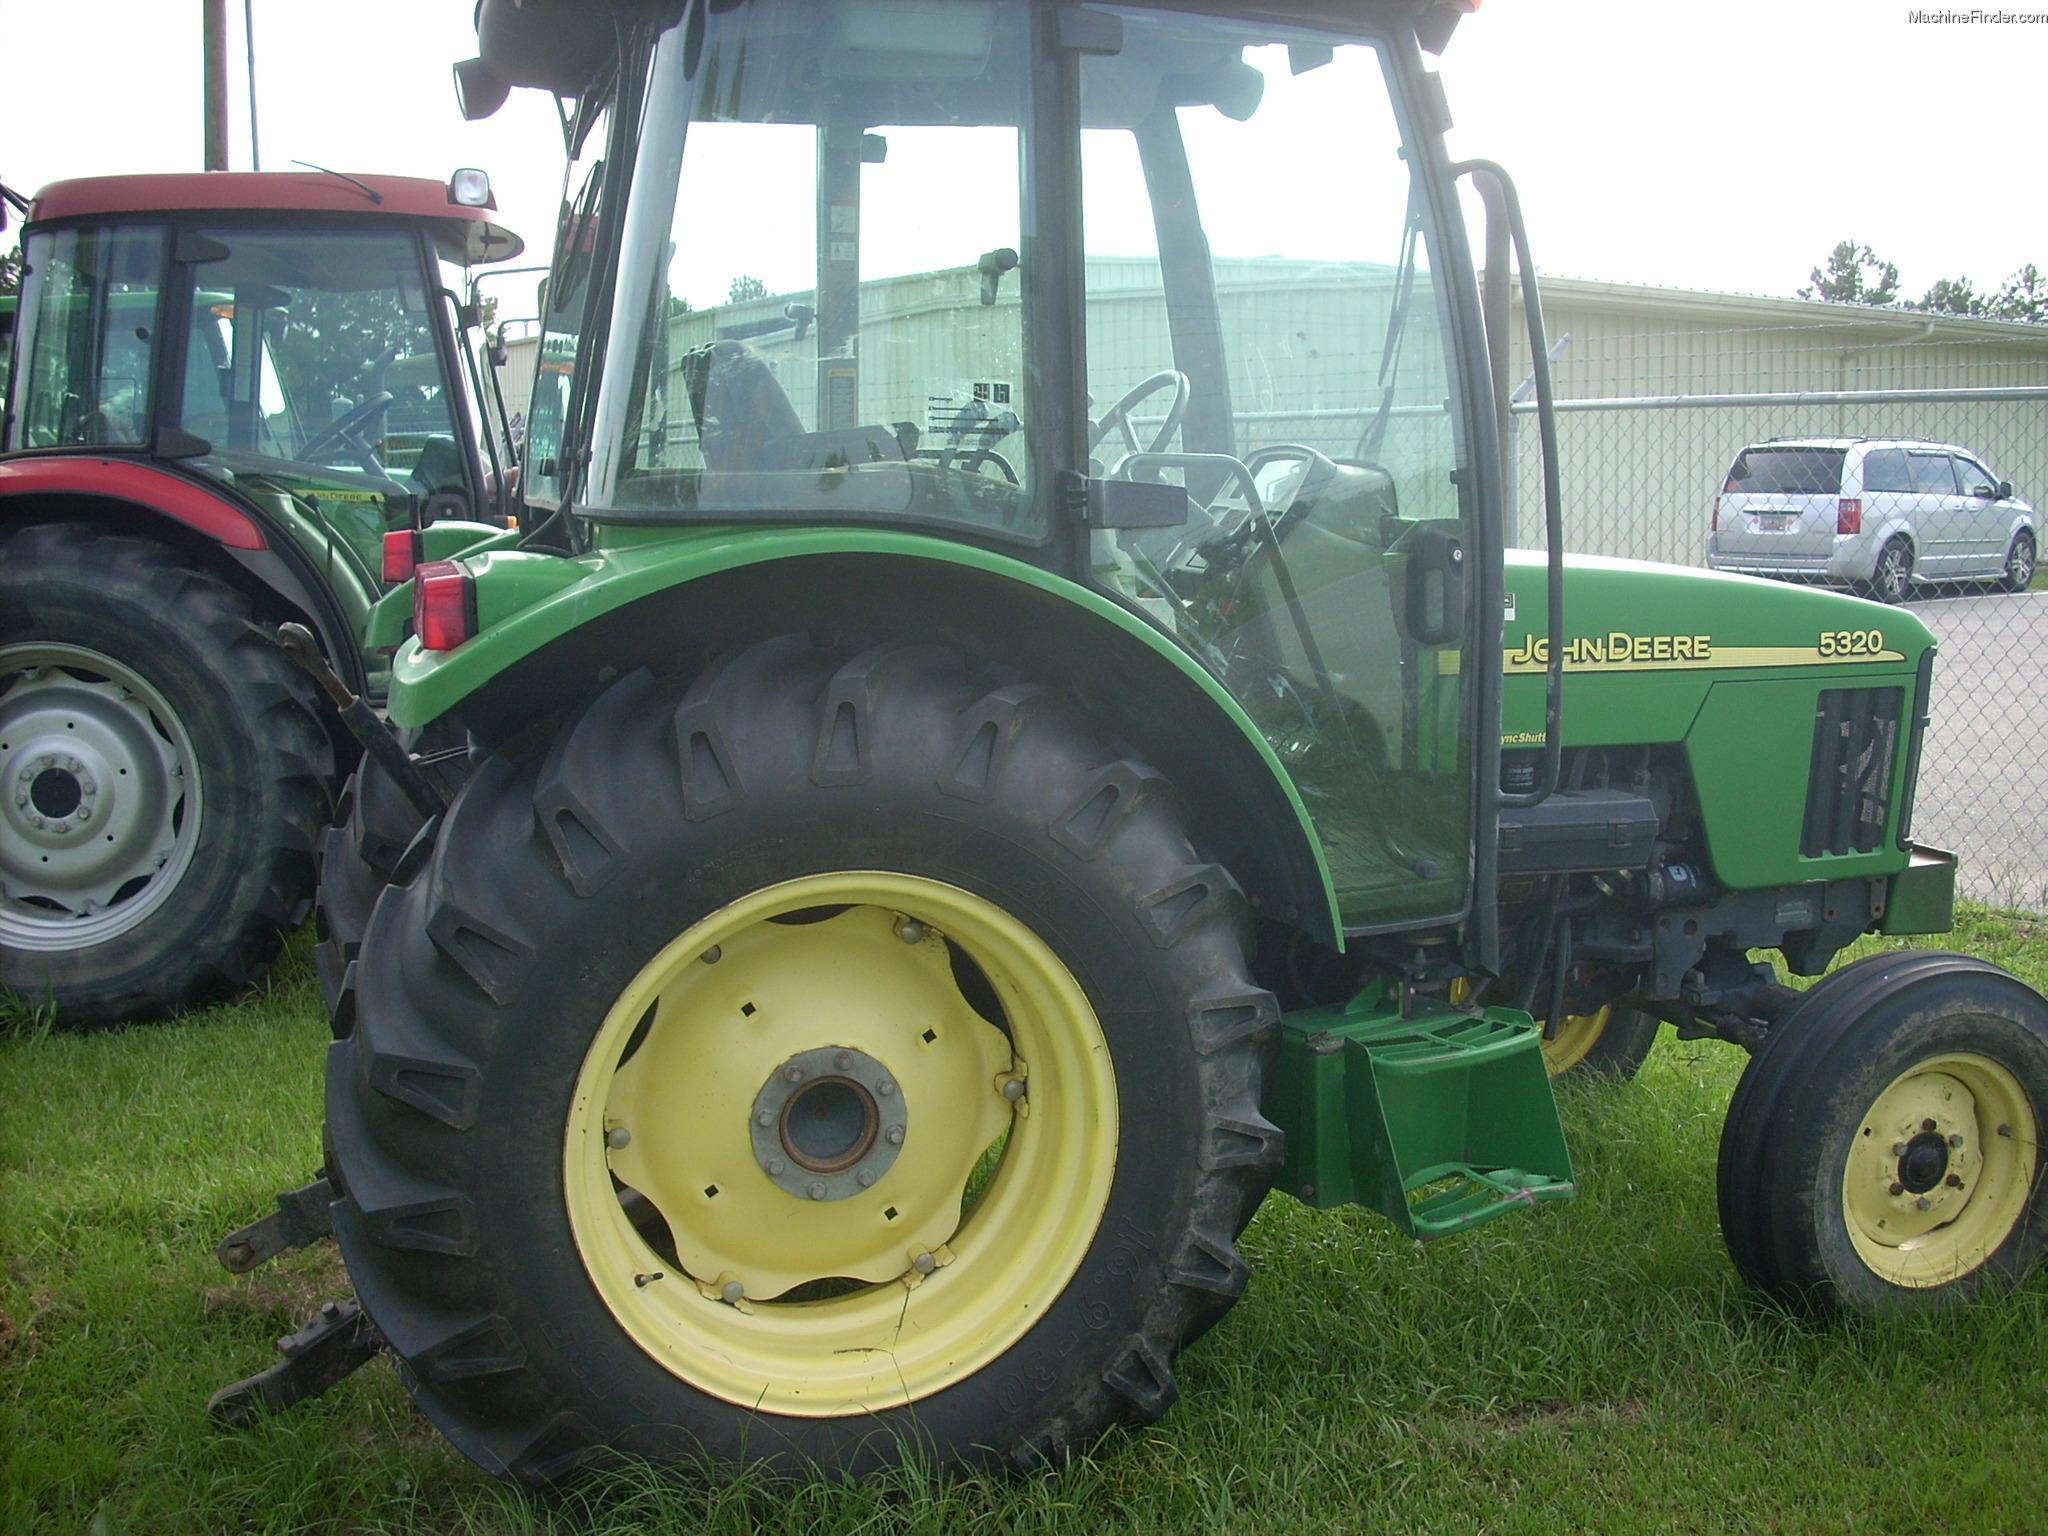 2002 John Deere 5320 Tractors - Utility (40-100hp) - John ...